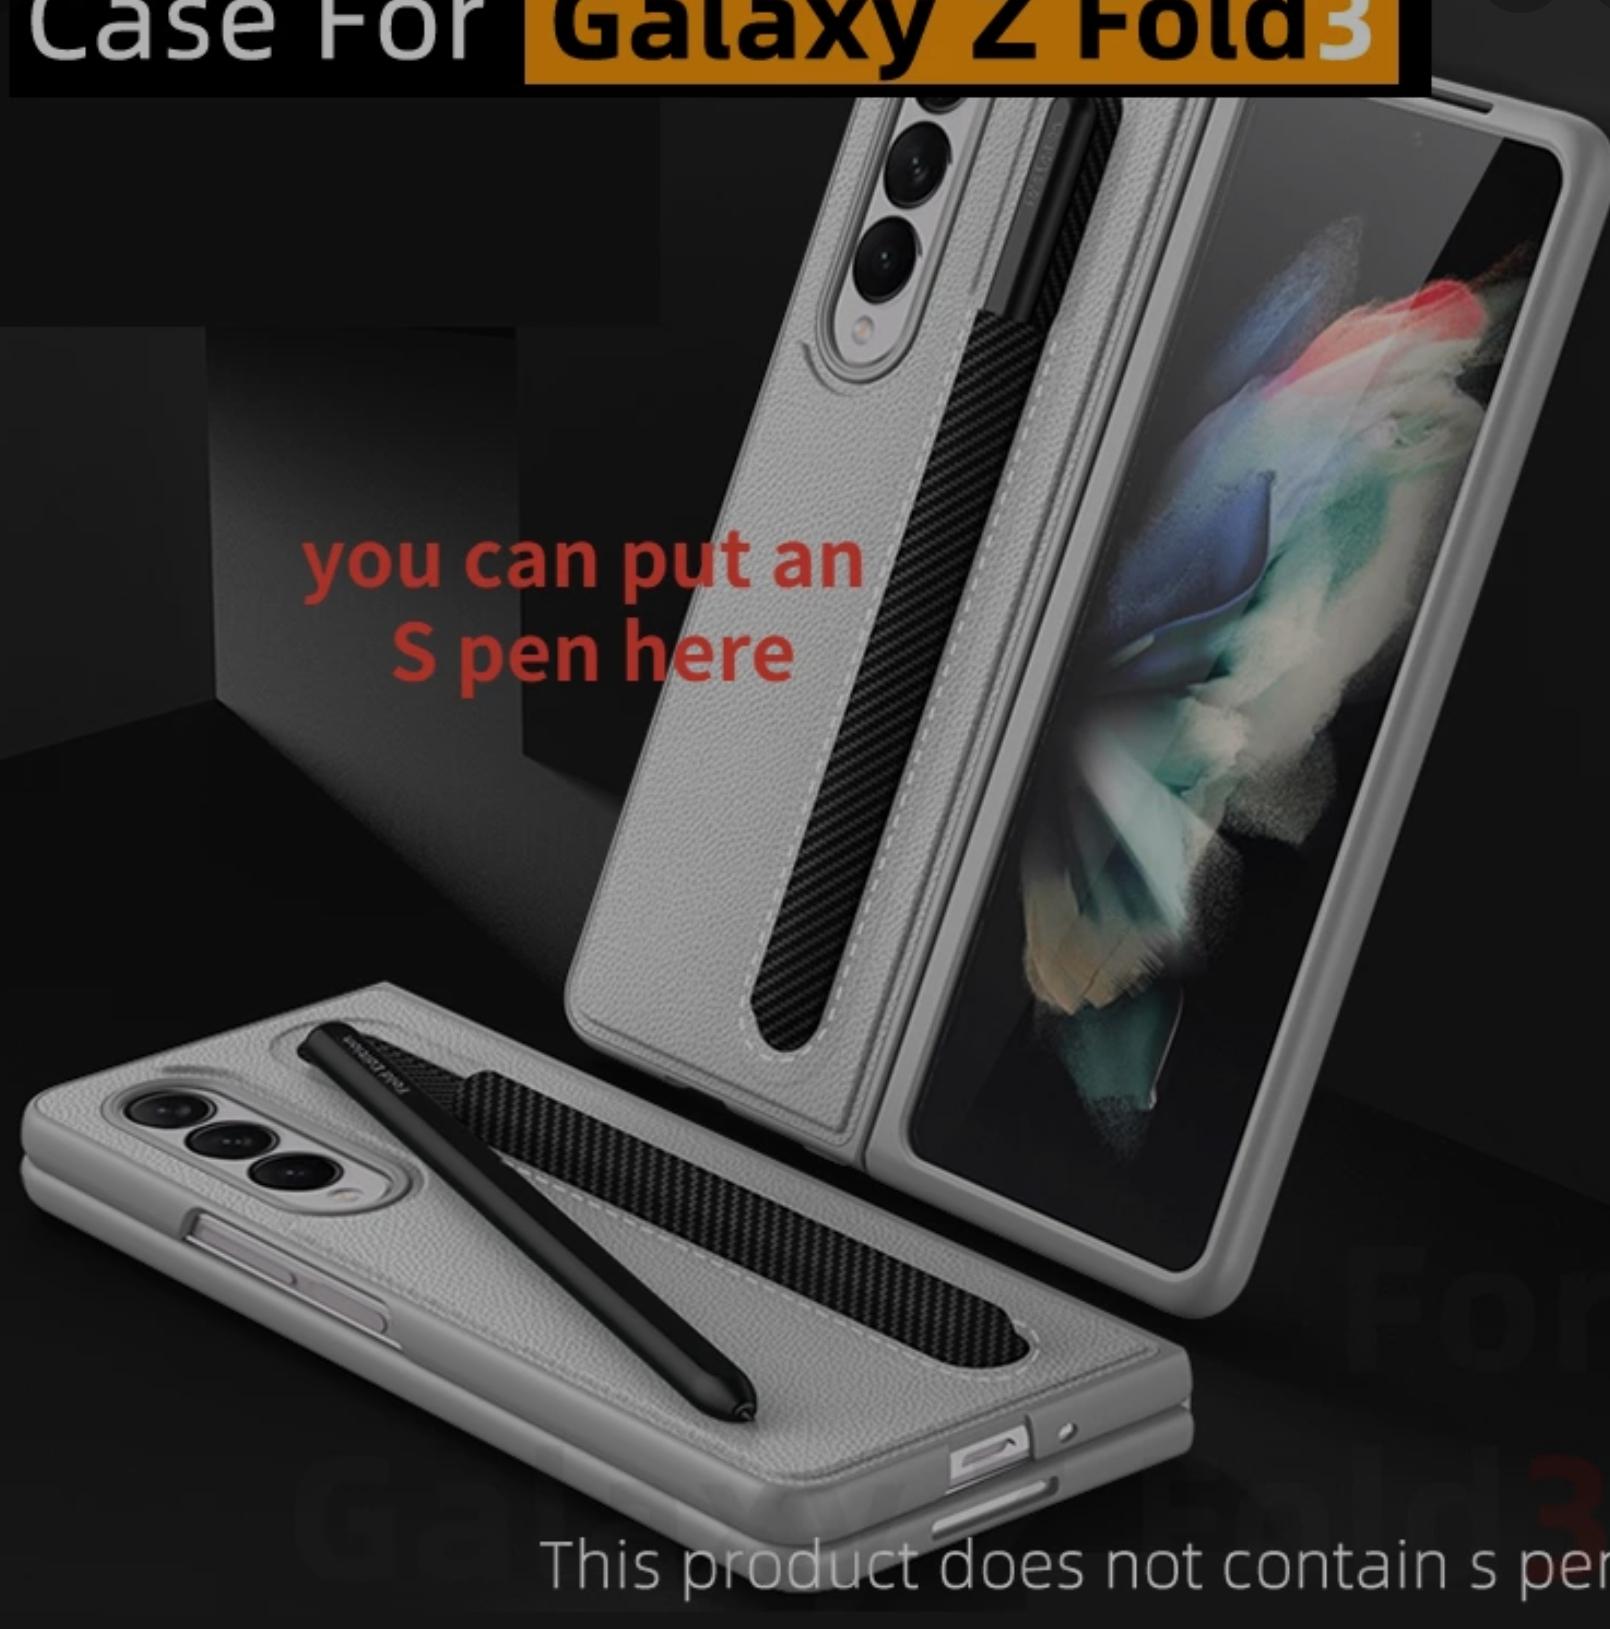 SmartSelect_20210922-143608_Samsung Internet.jpg